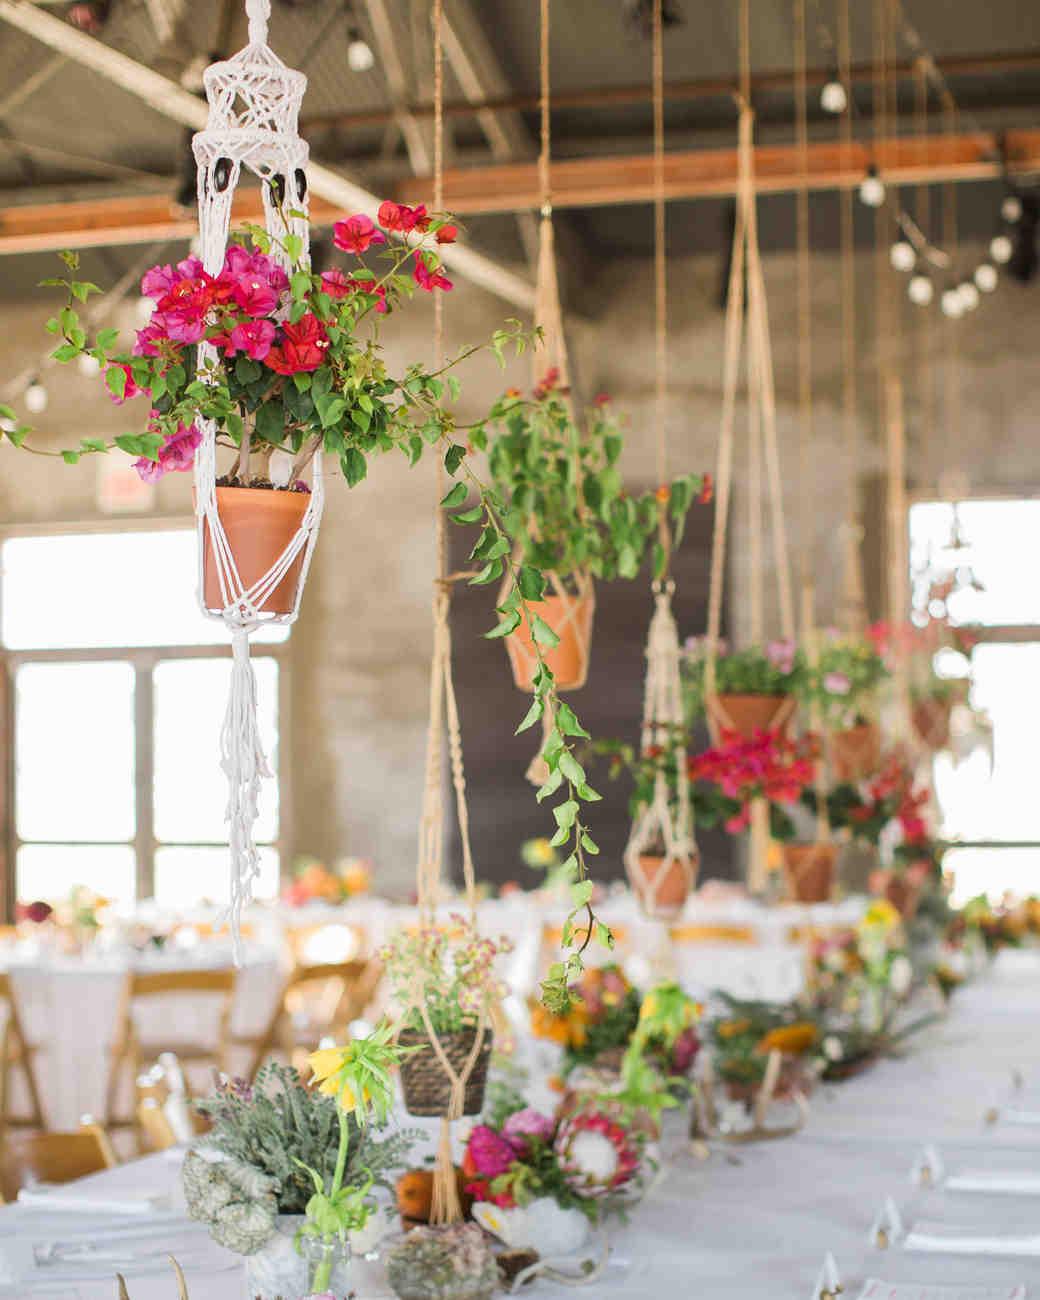 Cute Wedding Table Decorations Ideas